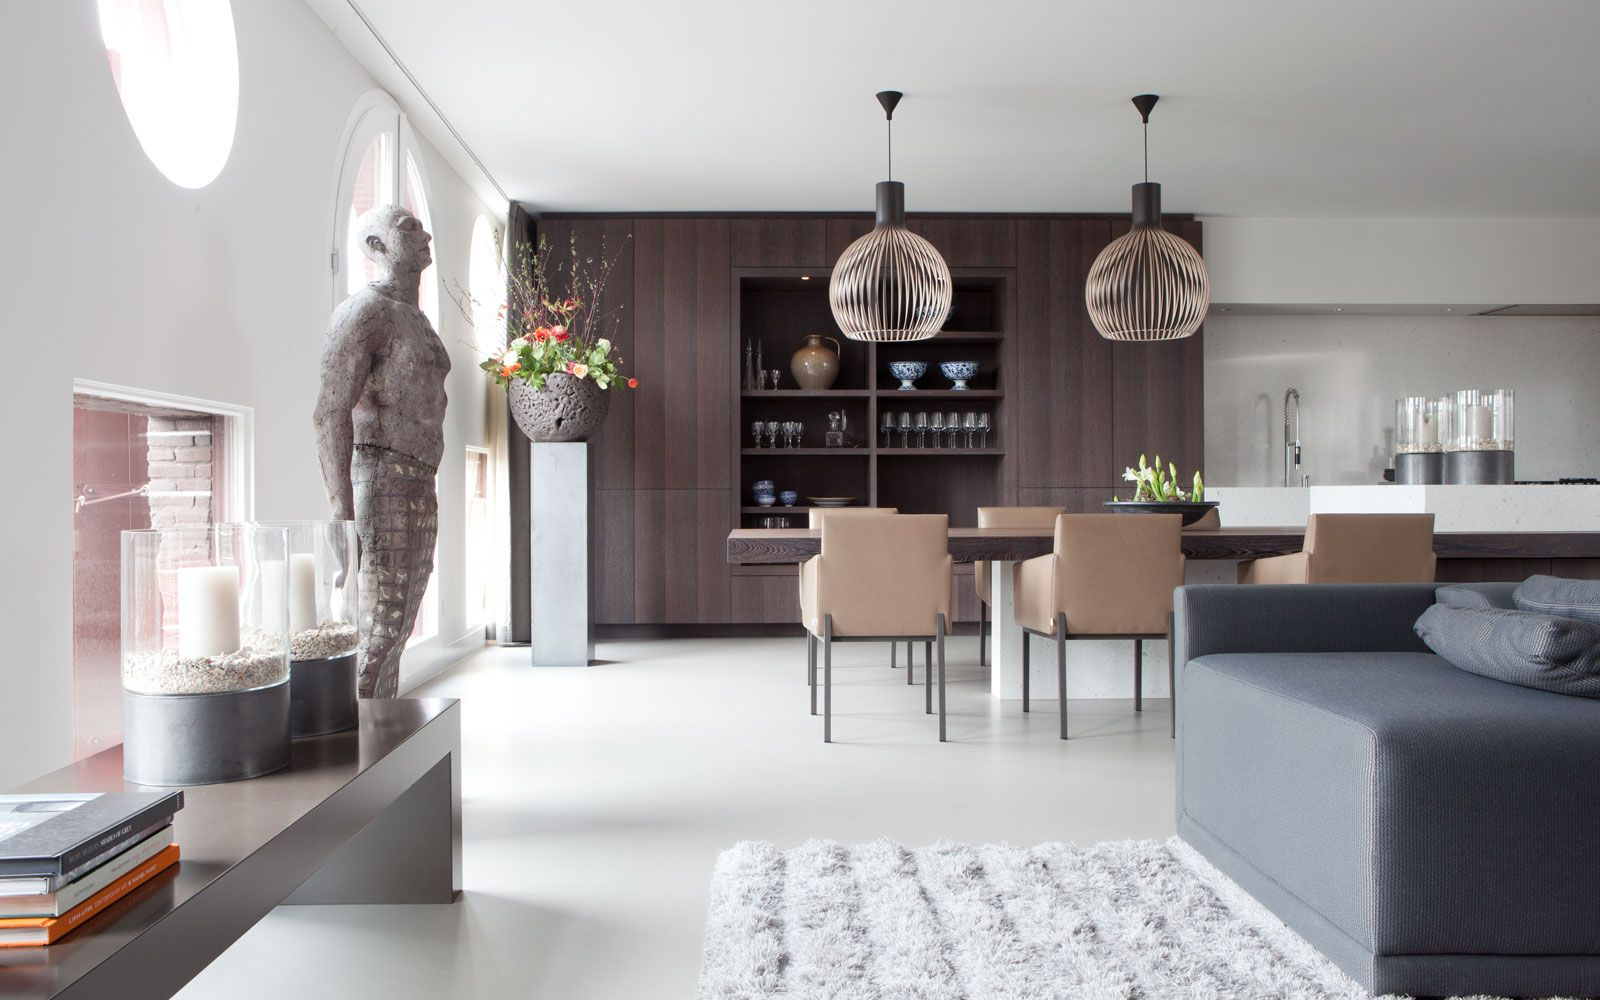 Exclusieve Gietvloer Woonkamer : Penthouse woonkamer decoratie pinterest pent house loft style